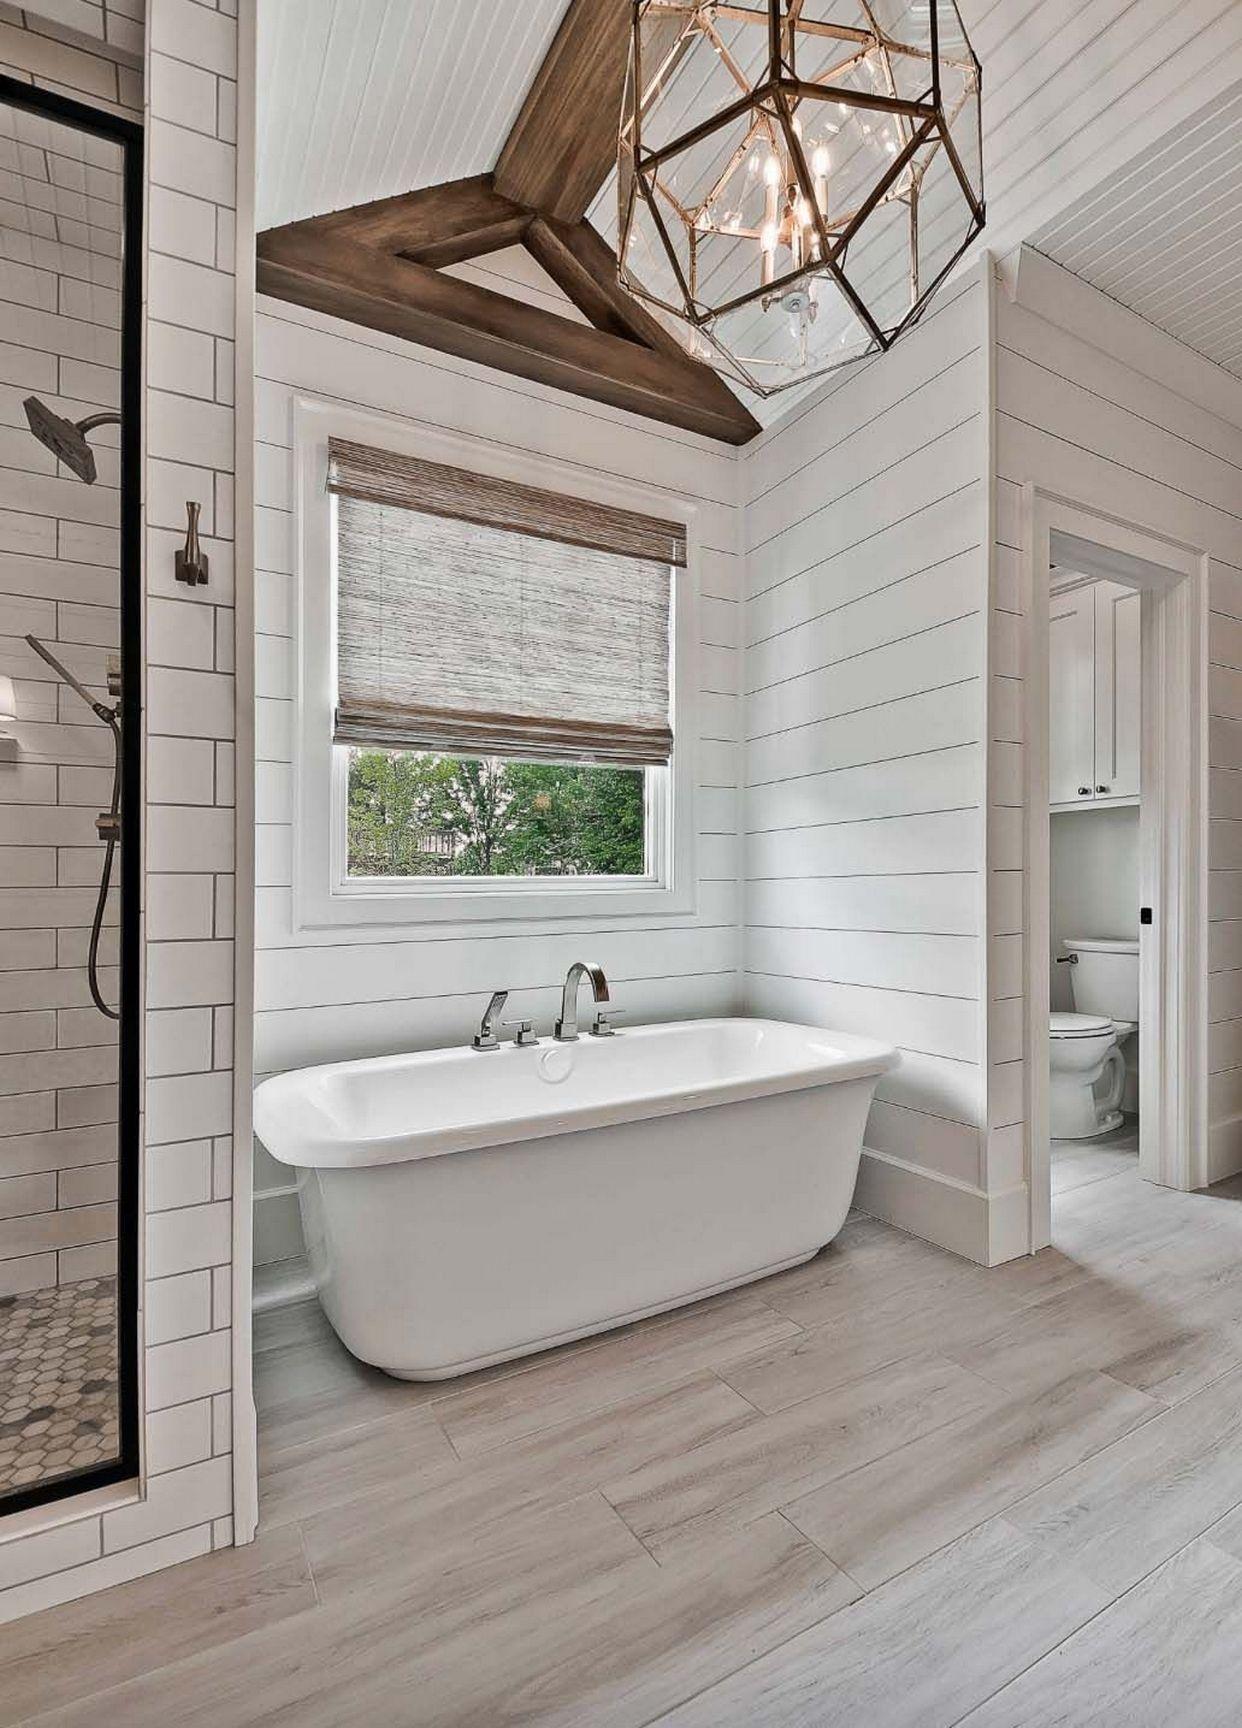 ✔️ 50+ Amazing Main Bathroom Model Ideas 59